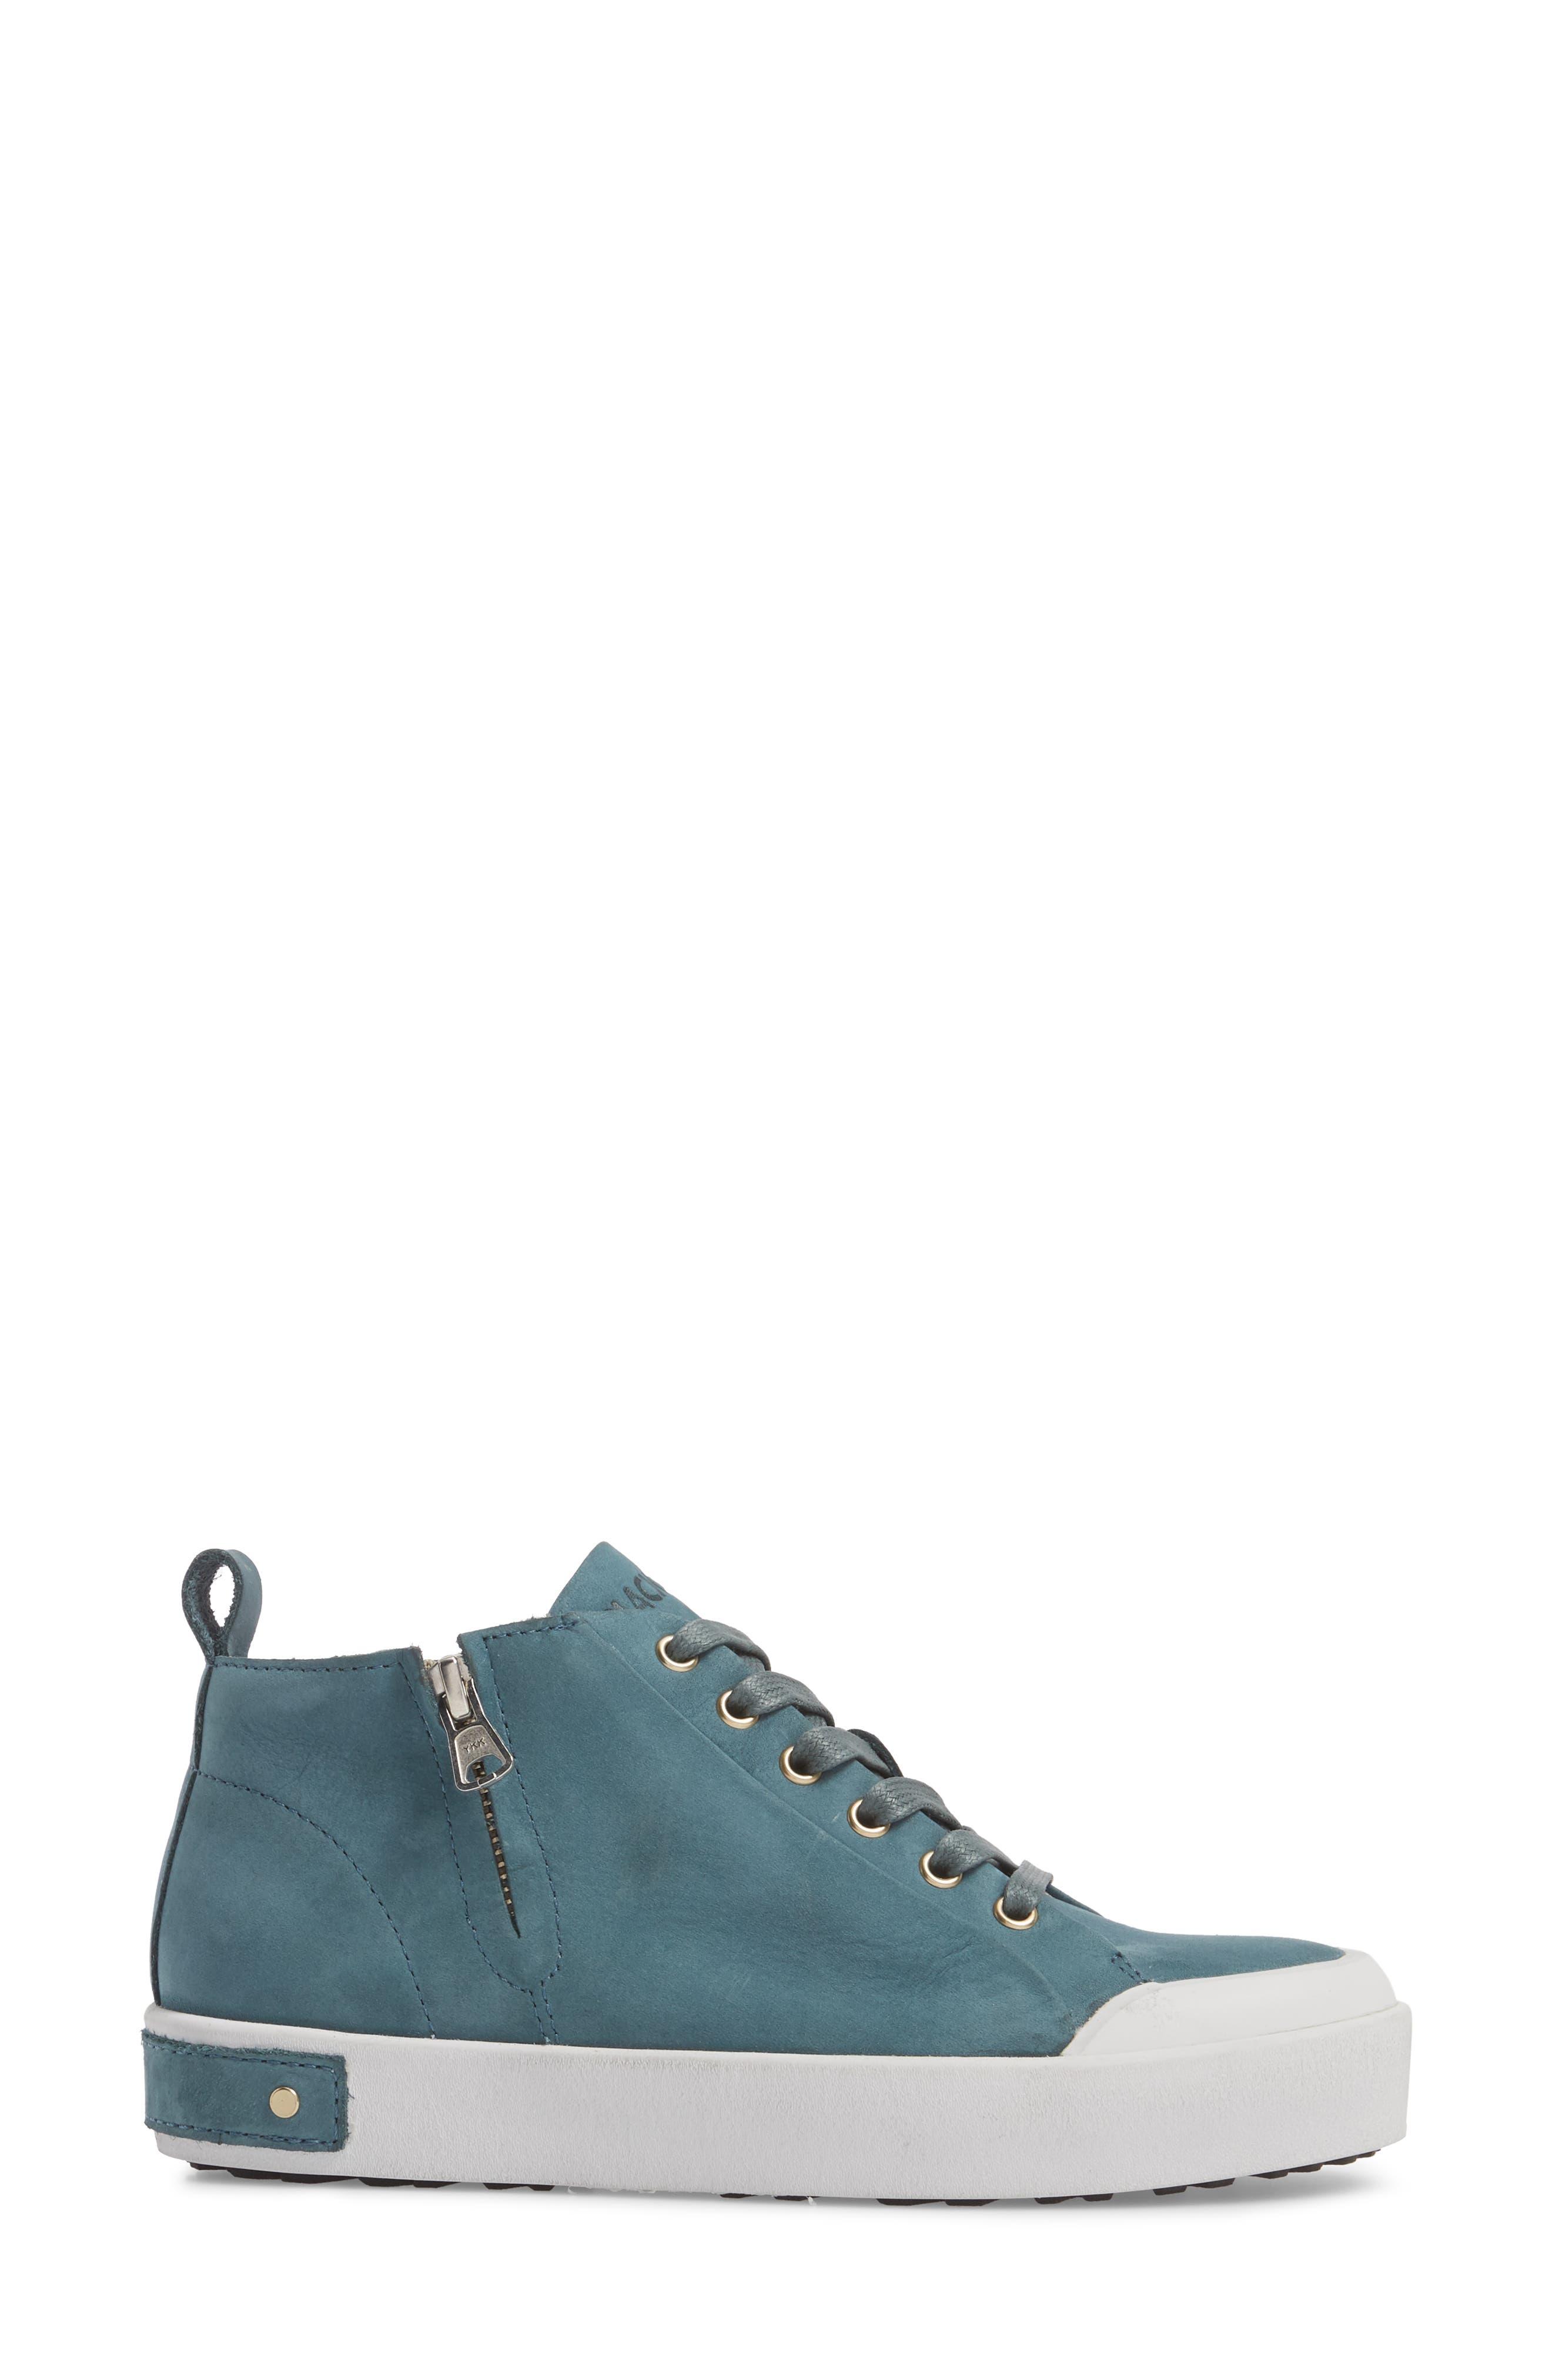 PL83 Mid Rise Sneaker,                             Alternate thumbnail 3, color,                             Mallard Blue Leather